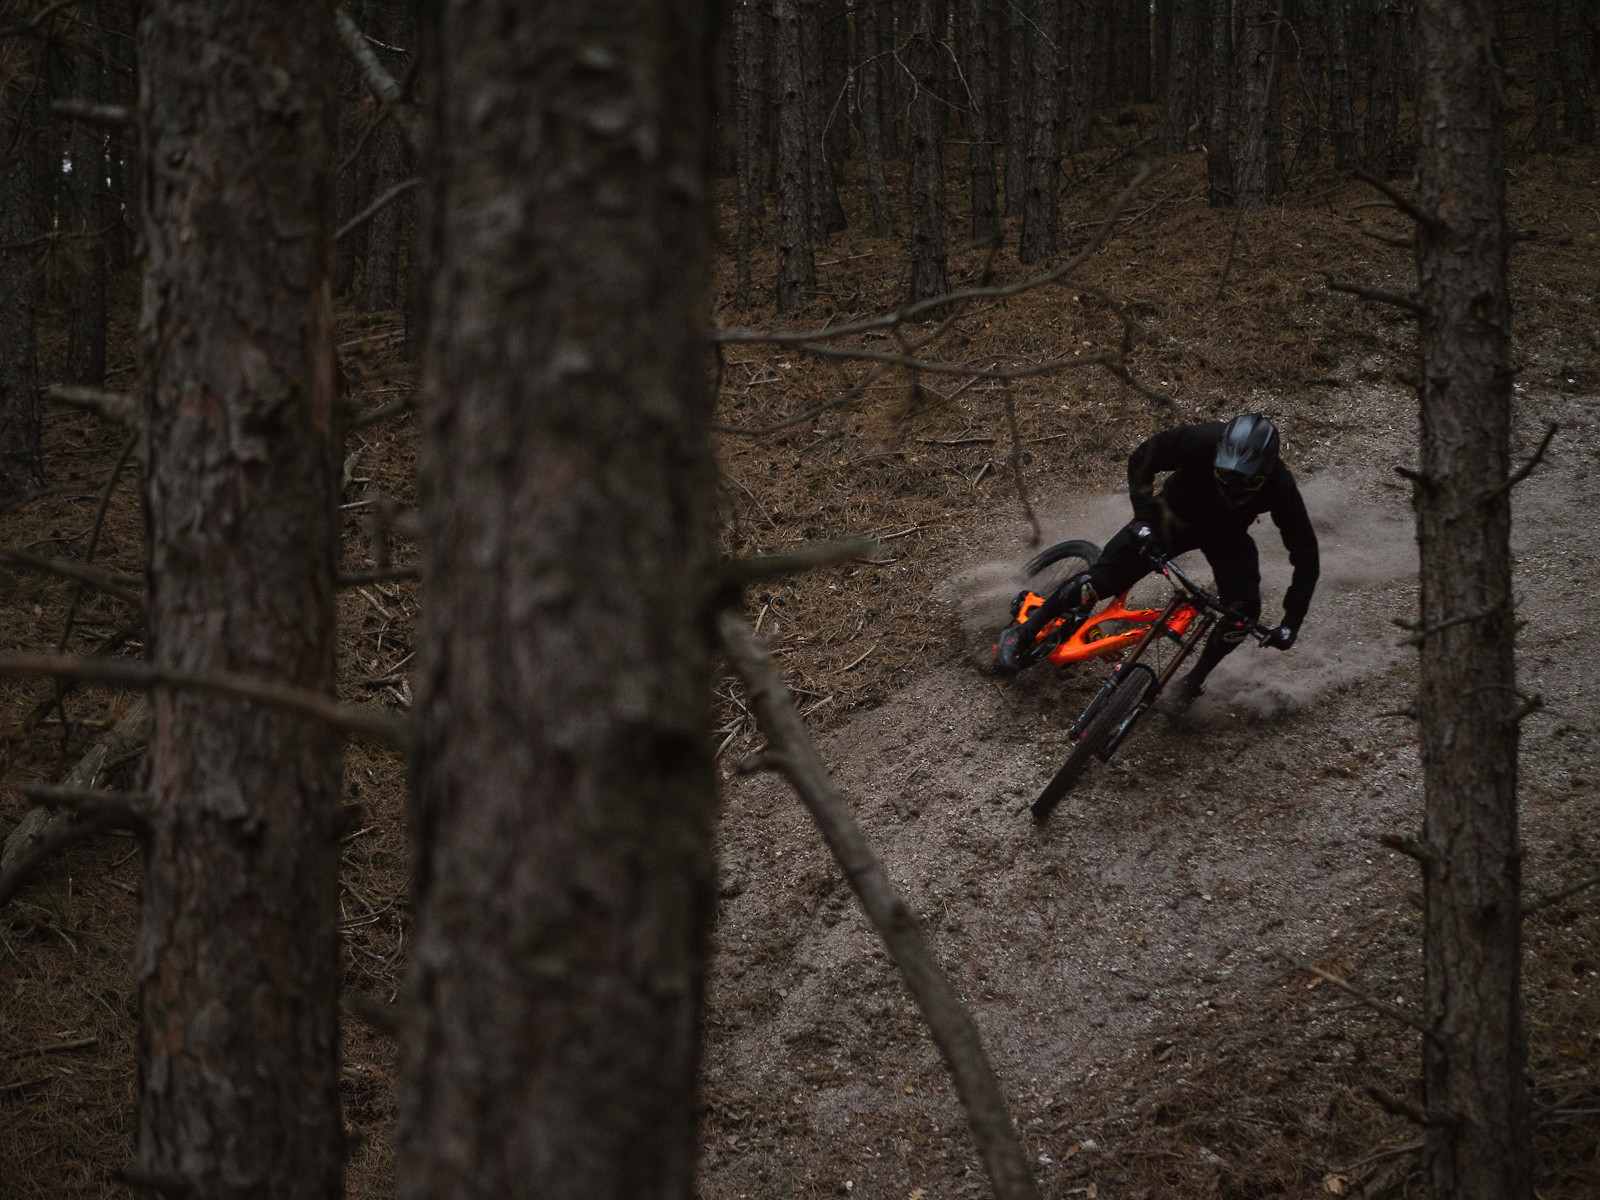 Until dusk - EWIA - Mountain Biking Pictures - Vital MTB